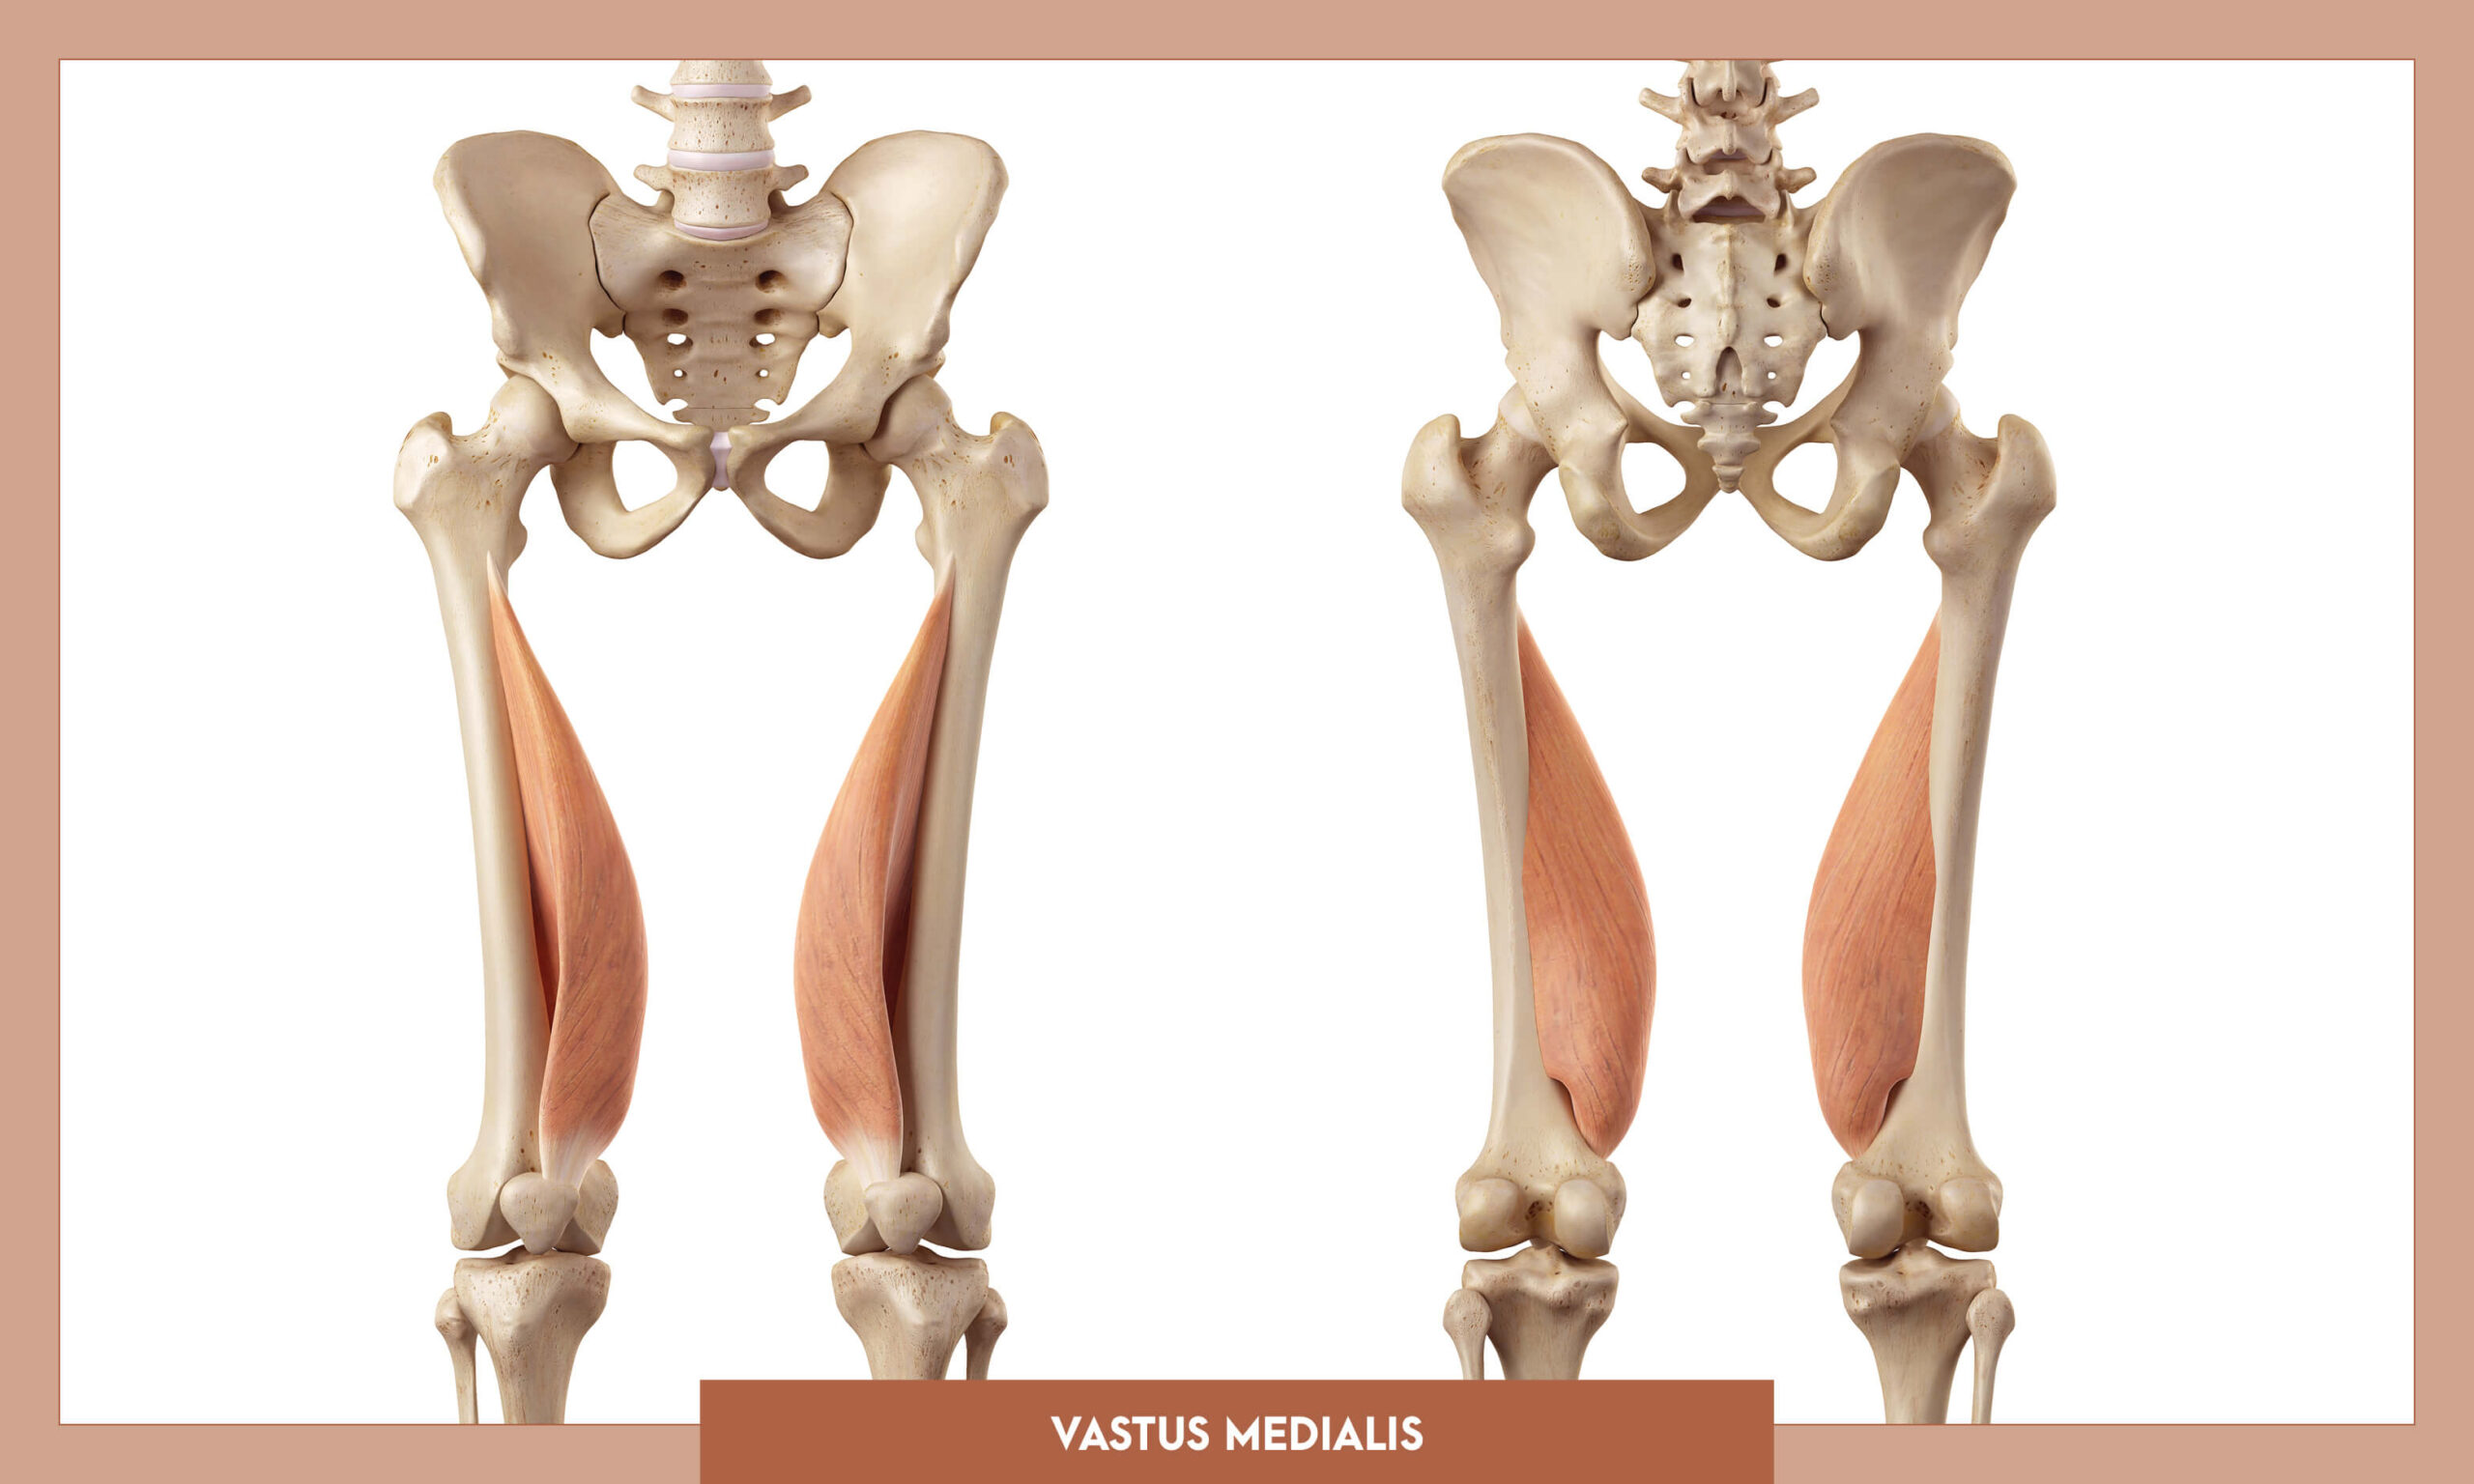 Muscles of thee Lower Limb - Vastus medialis